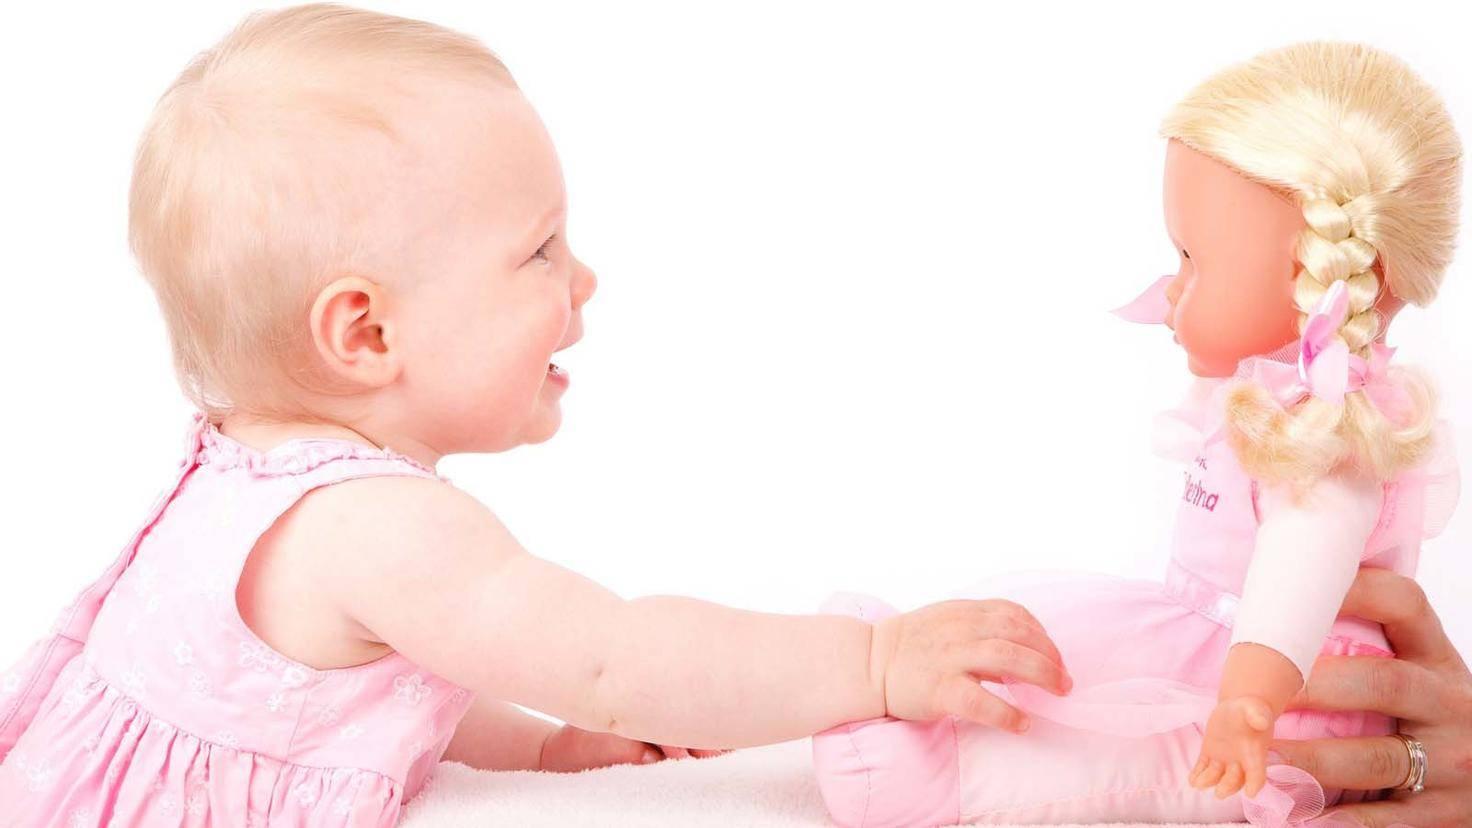 Baby-Puppe-Pixabay